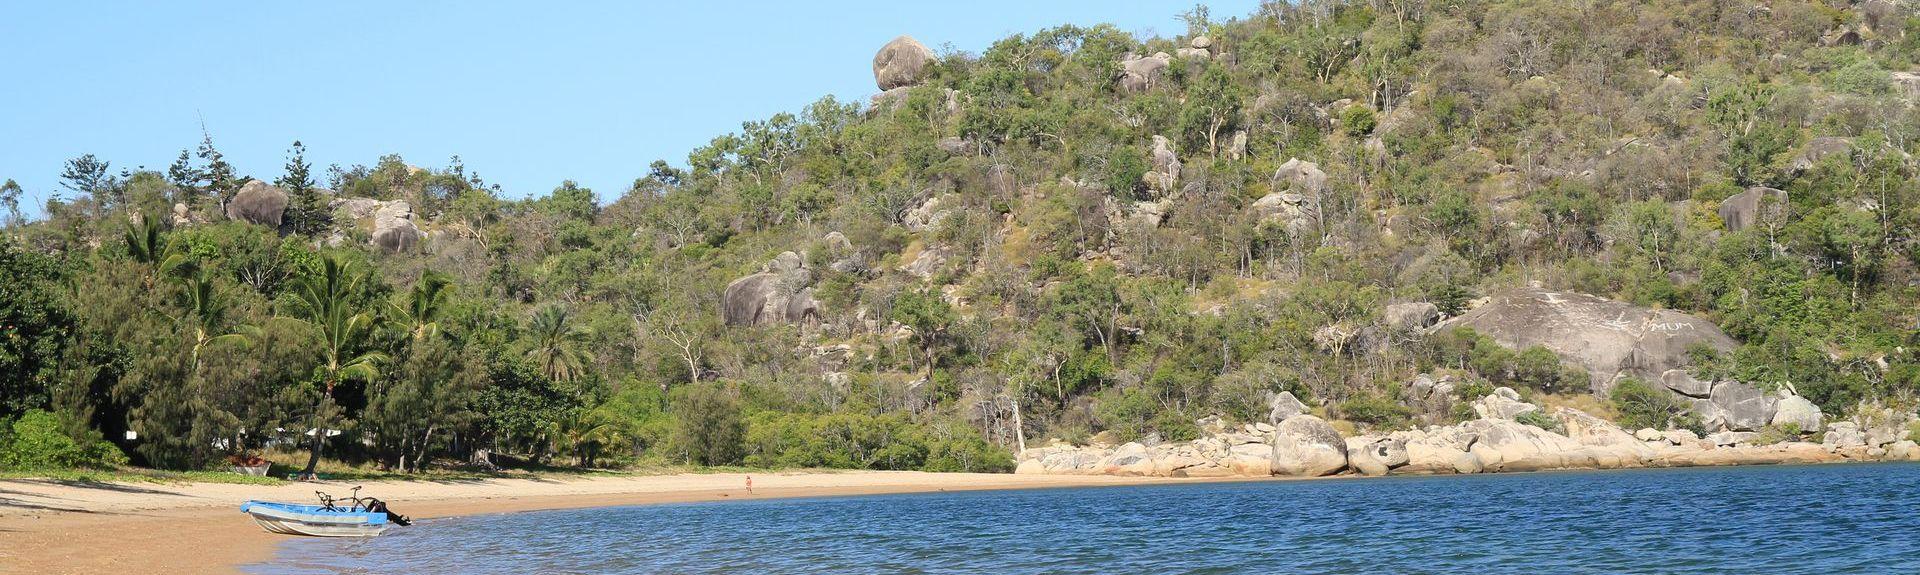 Anderson Park Botanical Gardens, Mundingburra, Queensland, AU